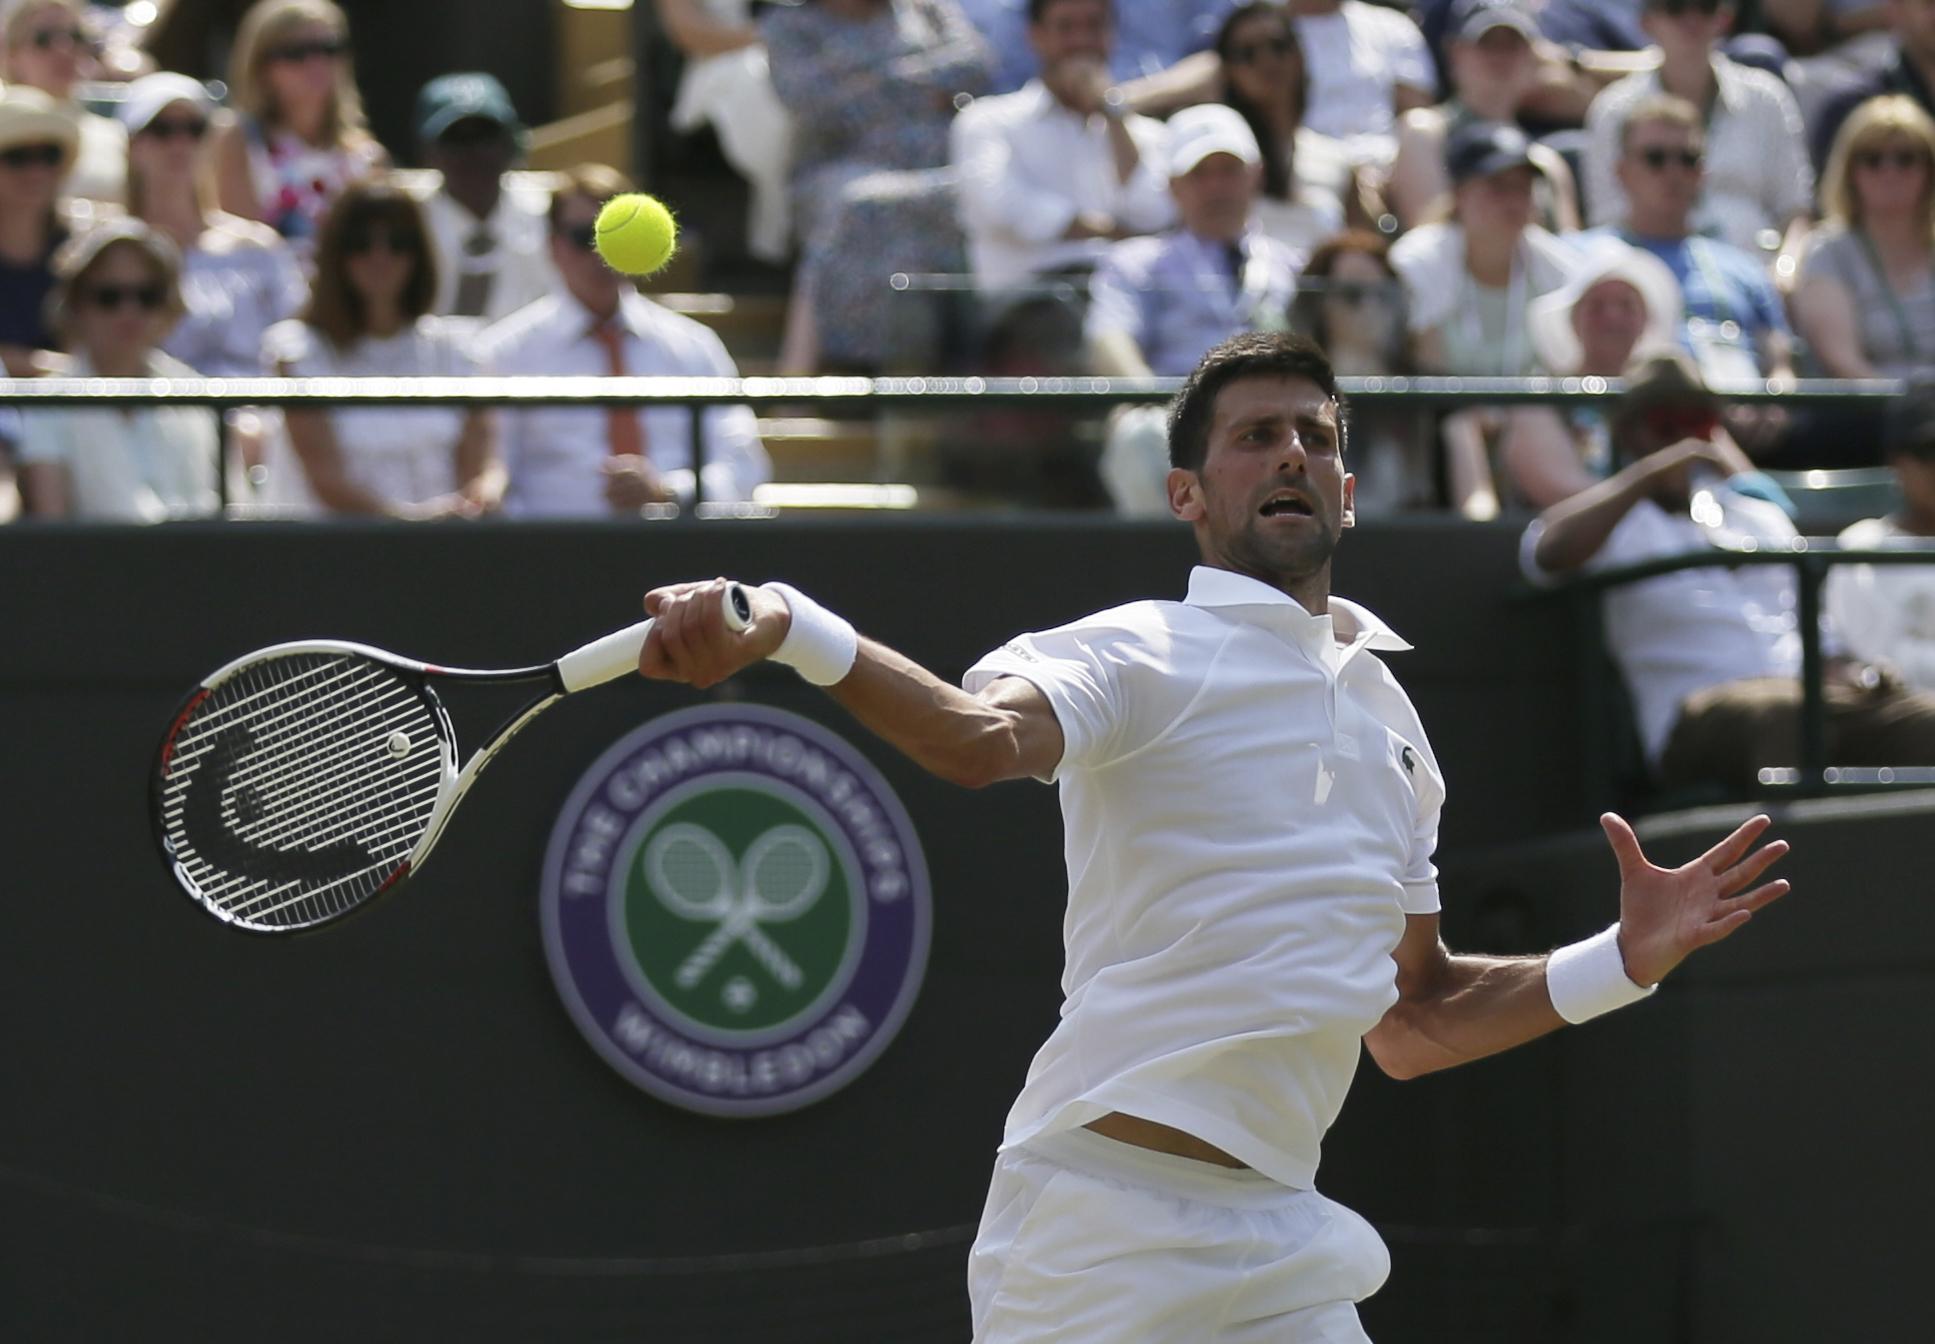 Serbia's Novak Djokovic plays against Czech Republic's Adam Pavlasek during their Men's Singles Match on day four at the Wimbledon Tennis Championships in London Thursday, July 6, 2017. (AP Photo/Tim Ireland)